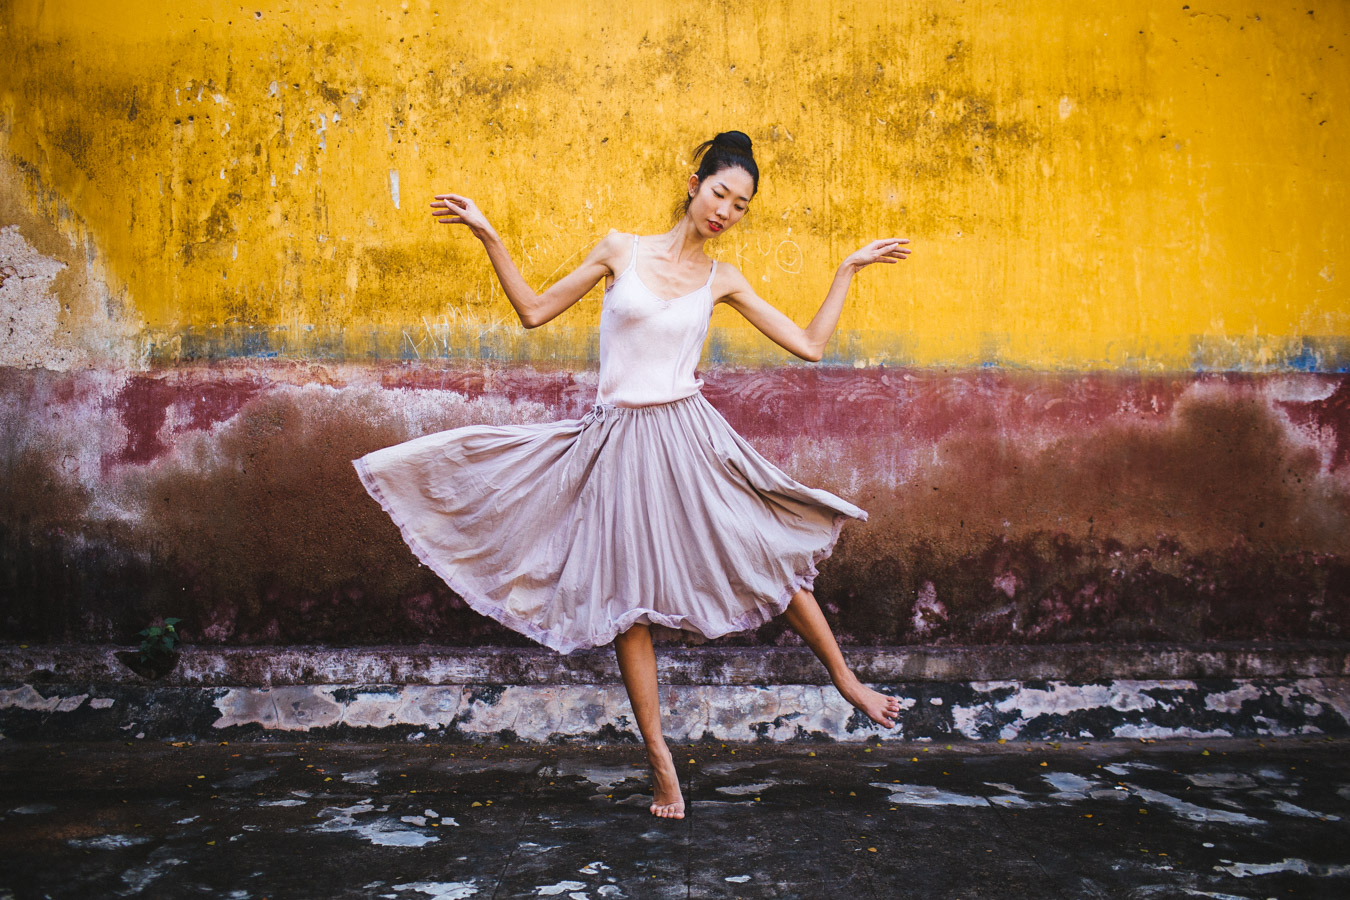 Asia-Fashion-Photographer-16-1.jpg